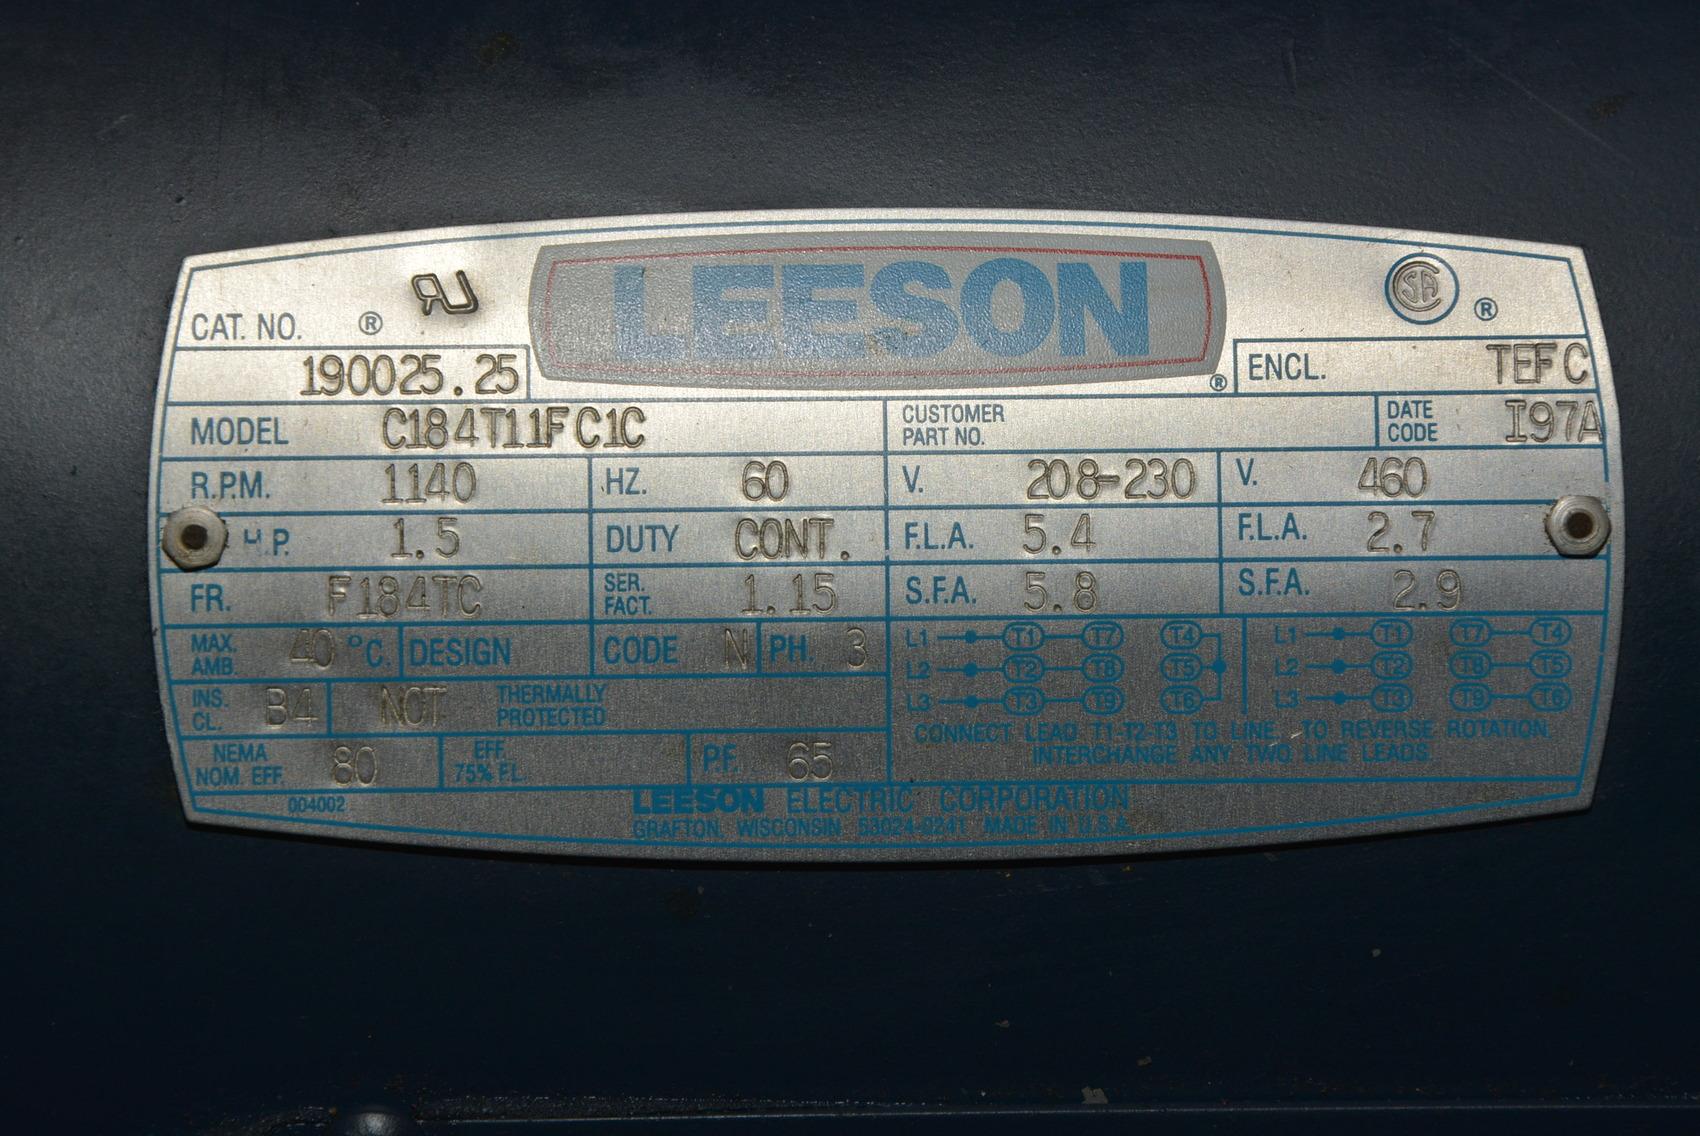 Leeson 190025 25 1 5 Hp 3